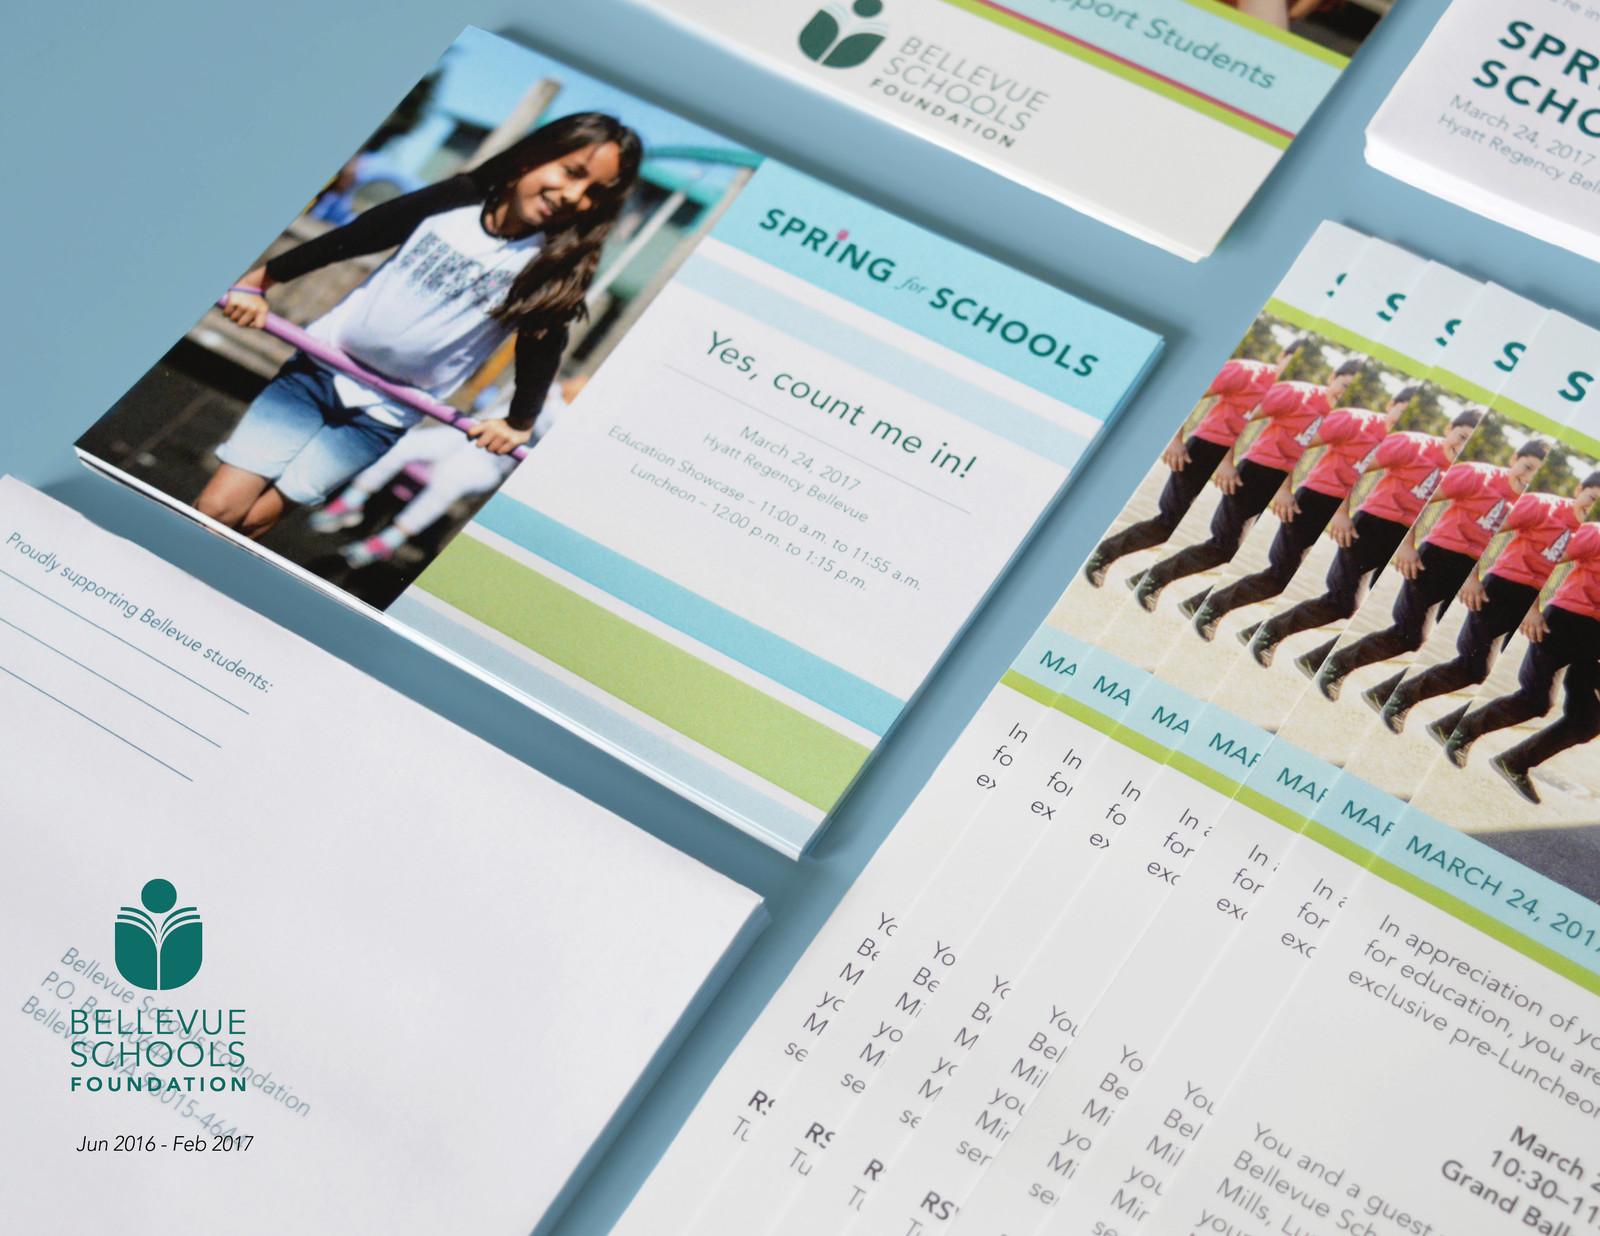 Spring for Schools Event Branding